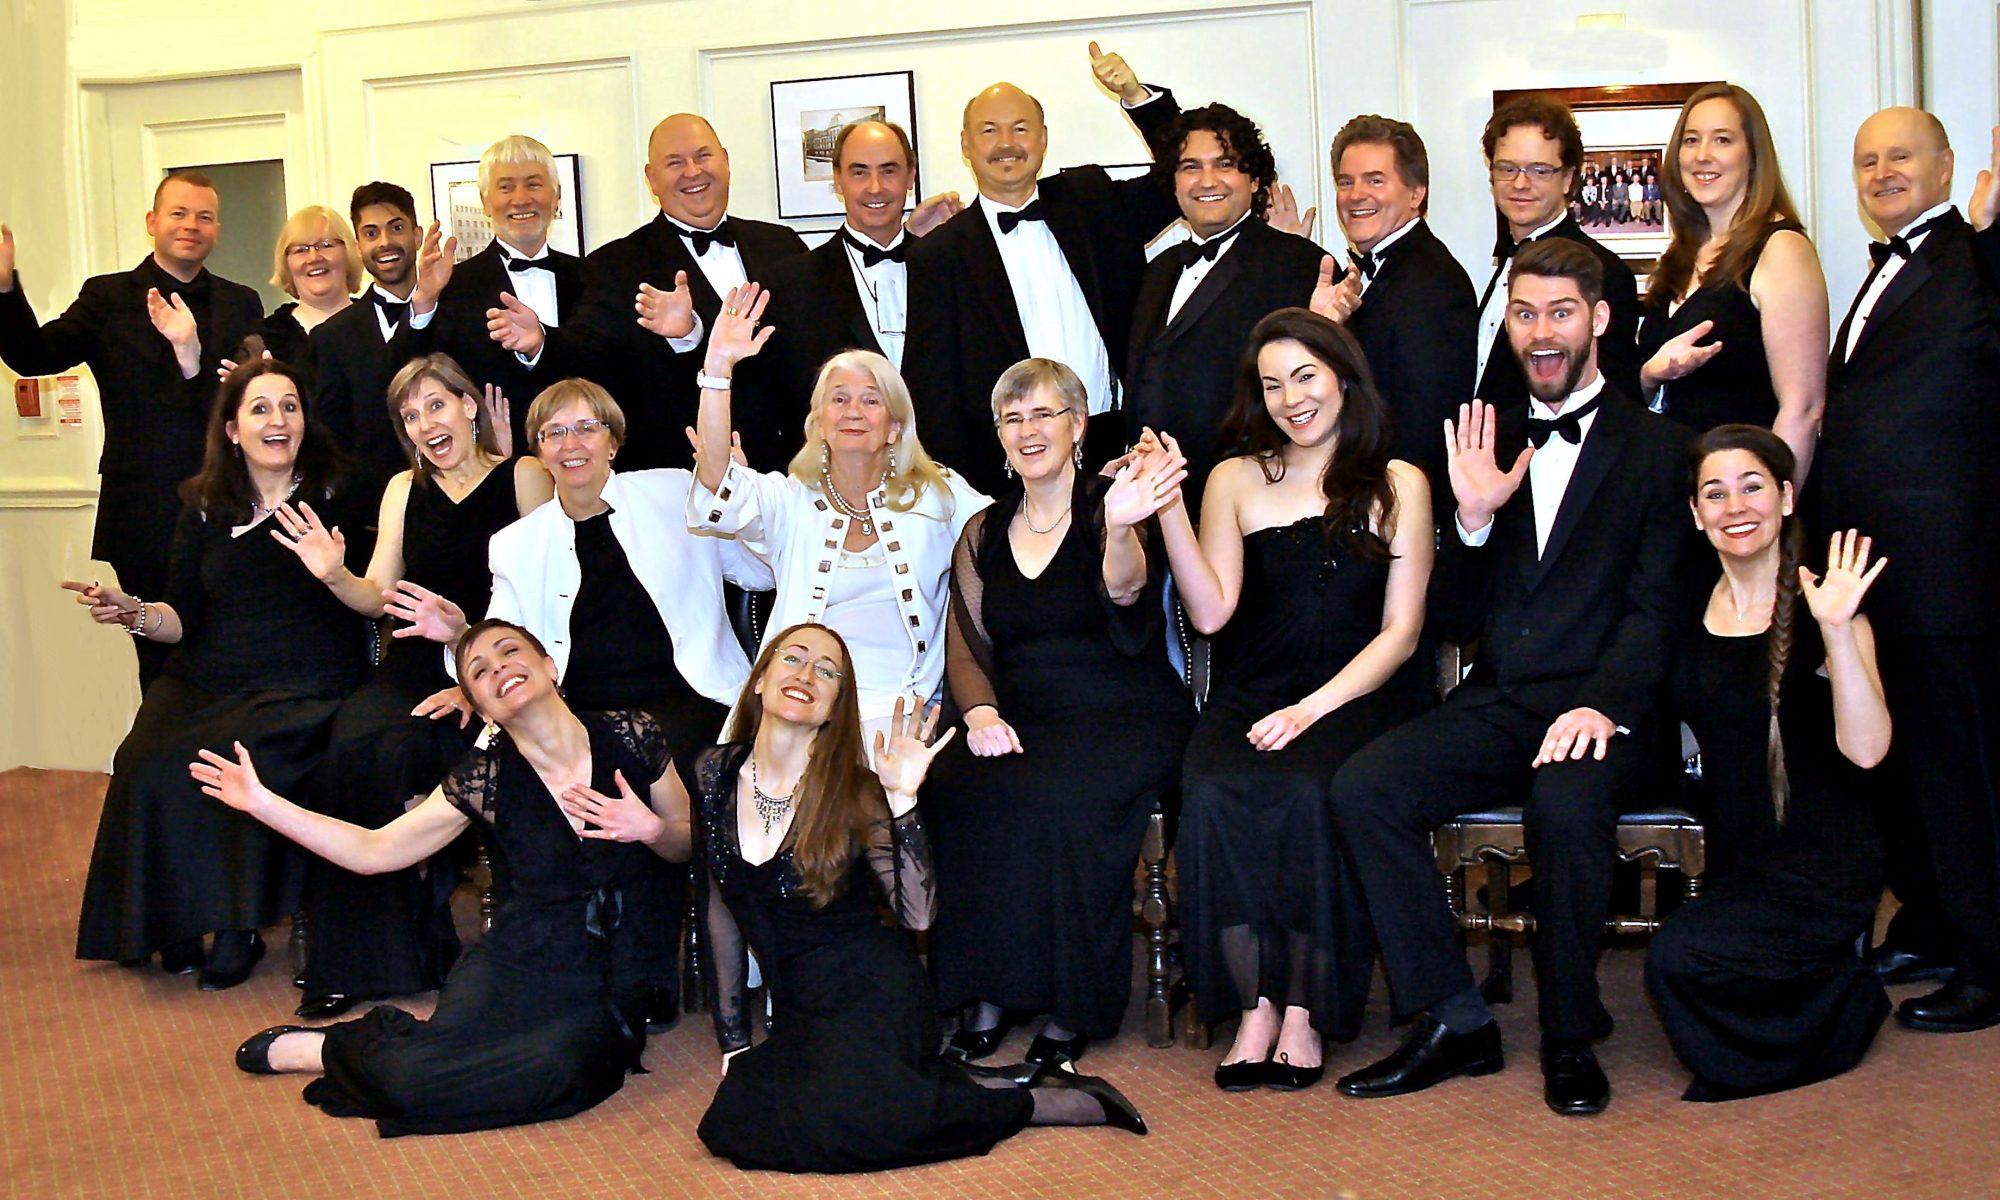 Elmer Iseler Singers, waving, photo: Michael_Romaniuk